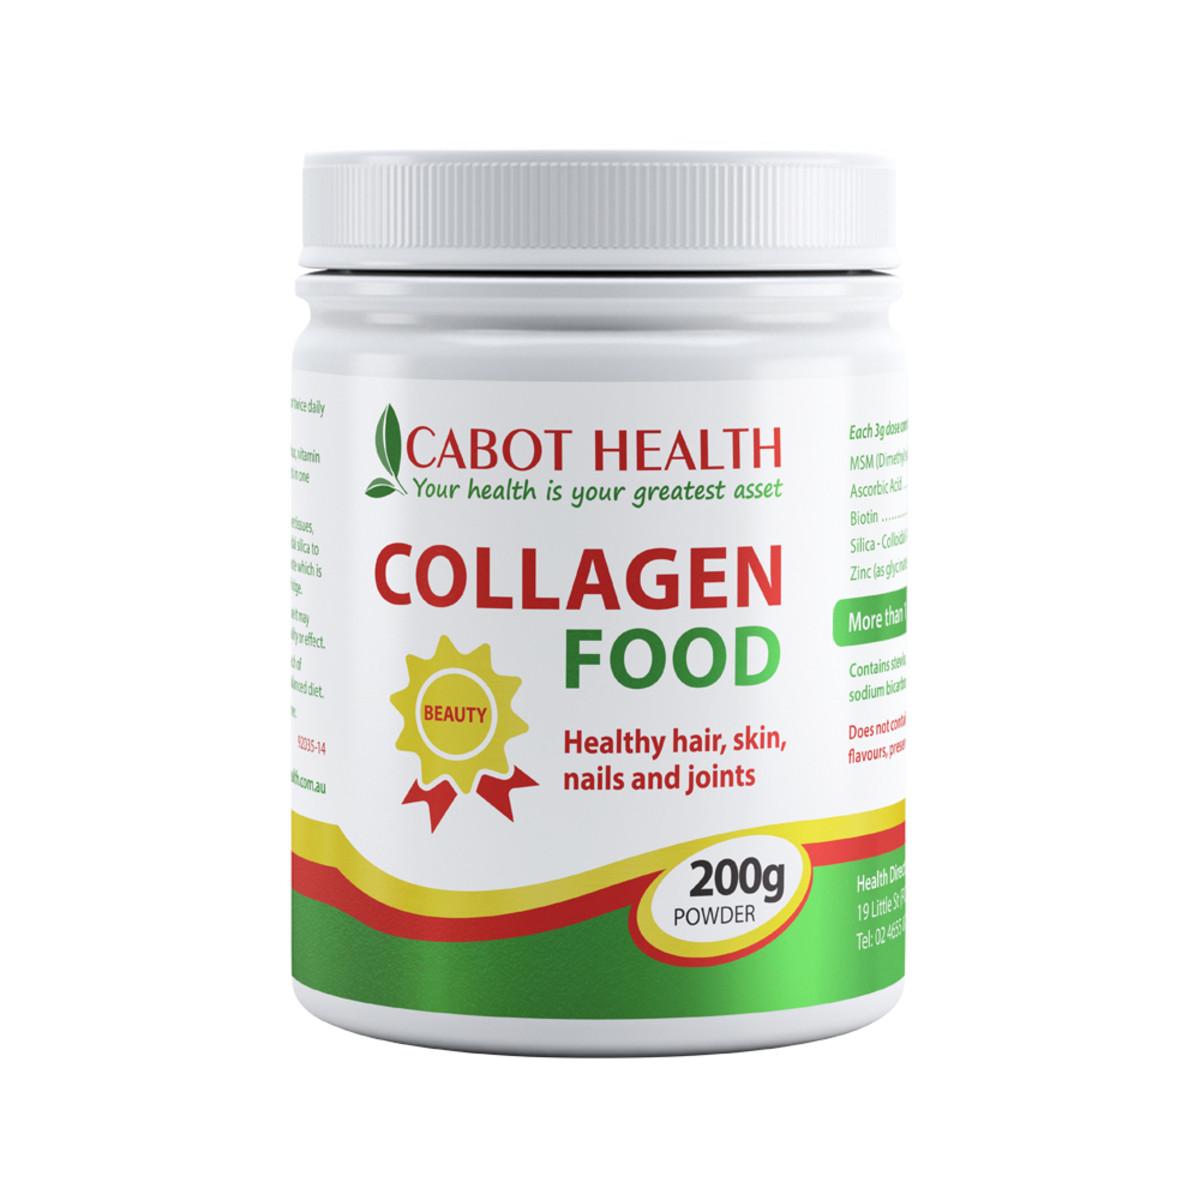 Image of Cabot Healh Collagen Food 200g (MSM Powder) Natural Lemon Flavour